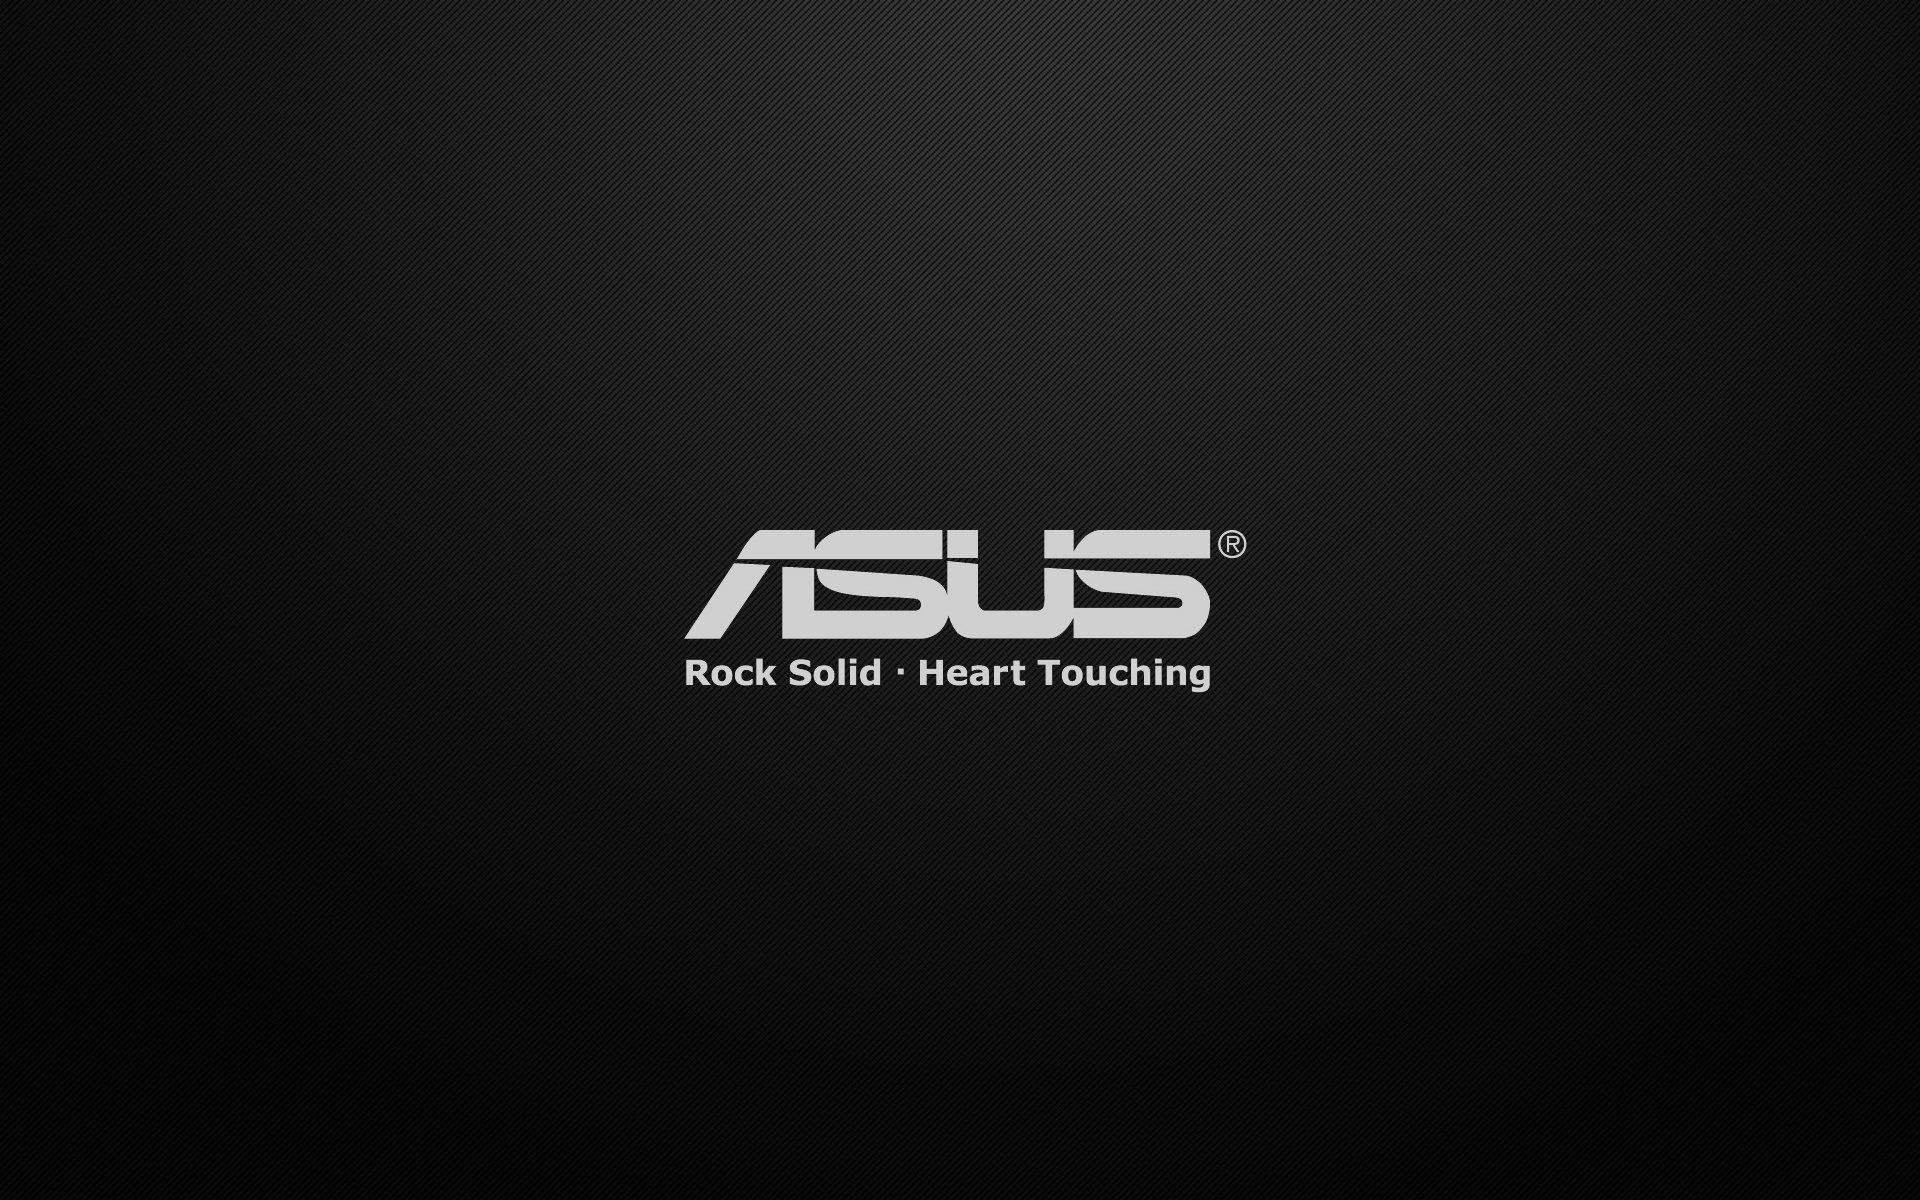 Asus Logo Wallpapers Top Free Asus Logo Backgrounds